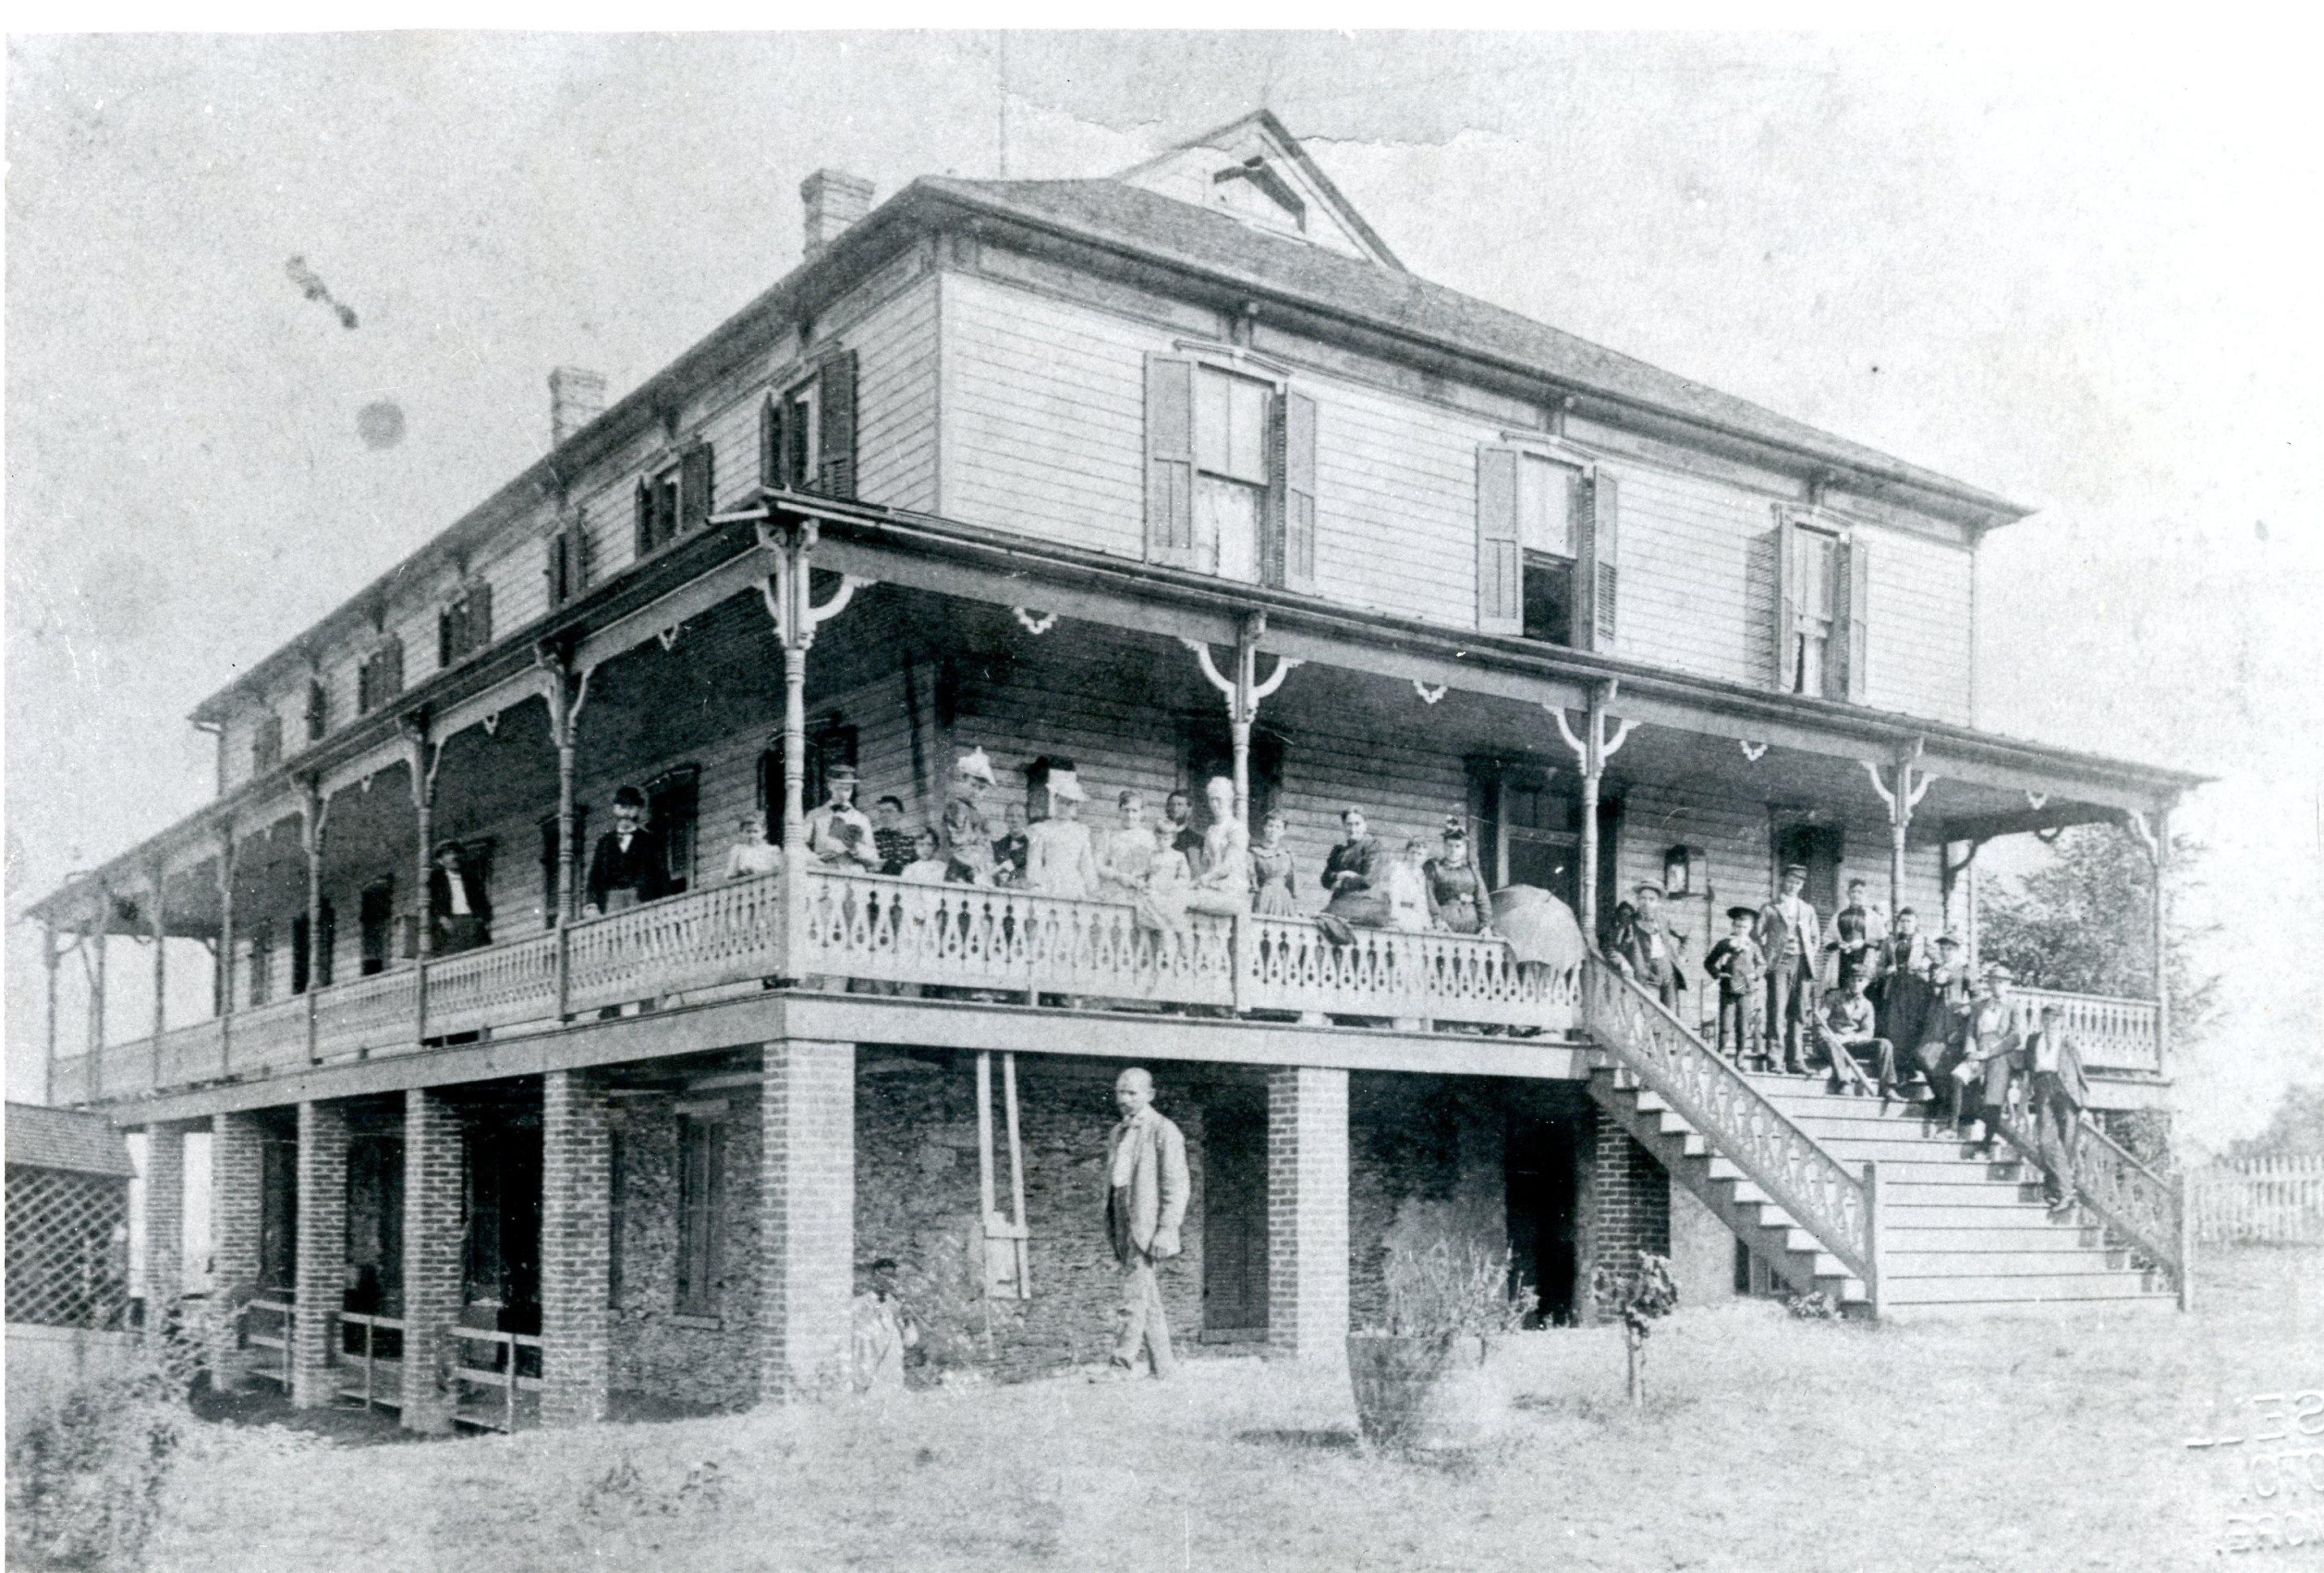 Hilltop House Hotel, 1892-1893